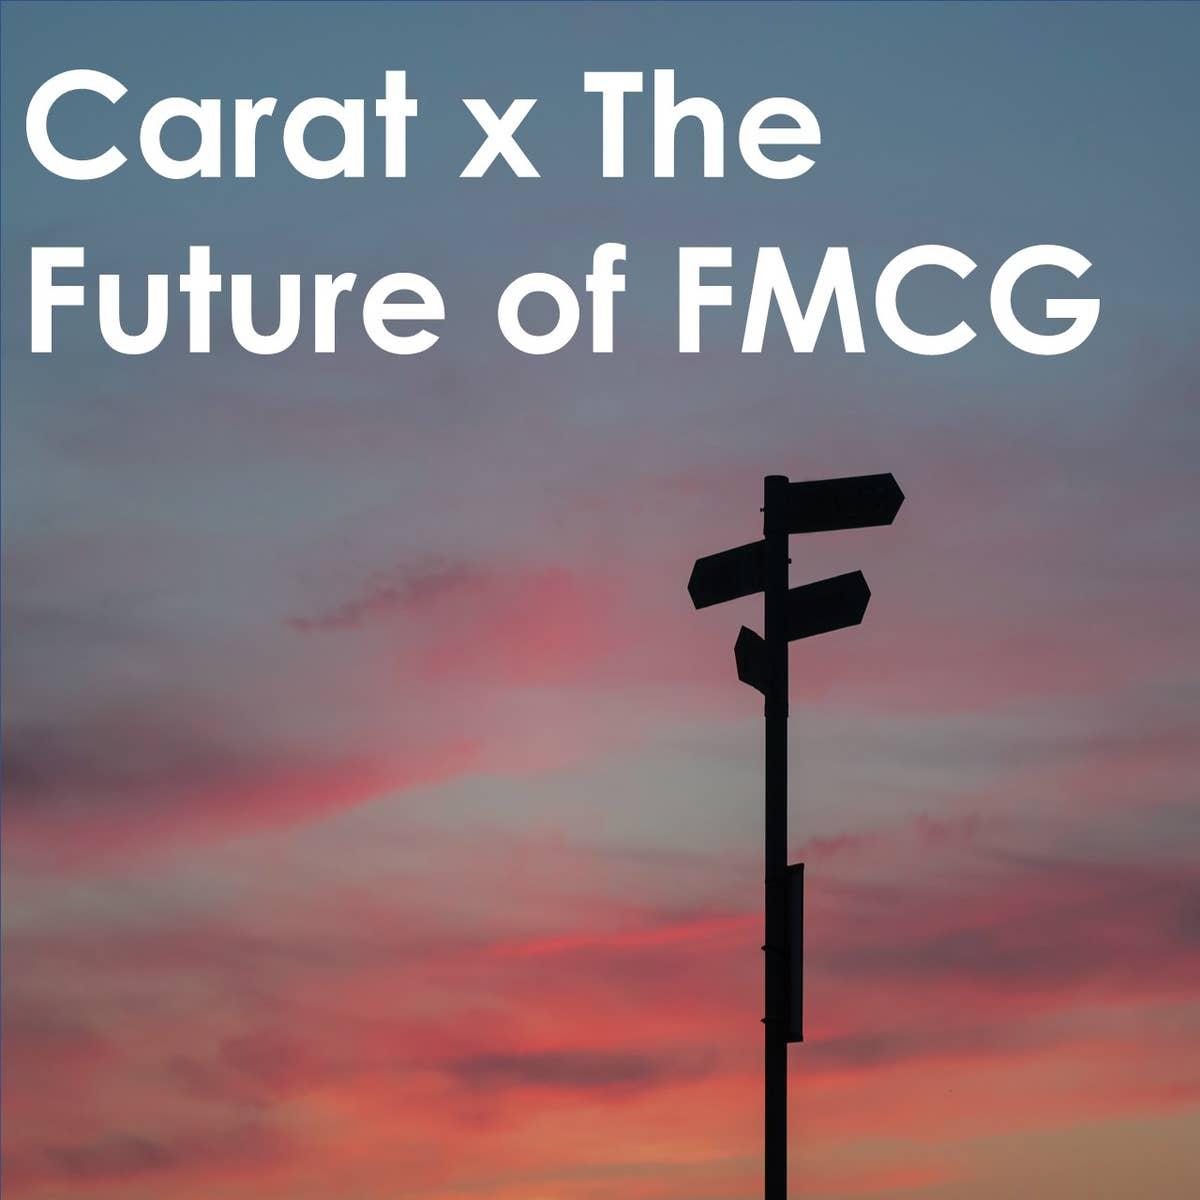 Future of FMCG